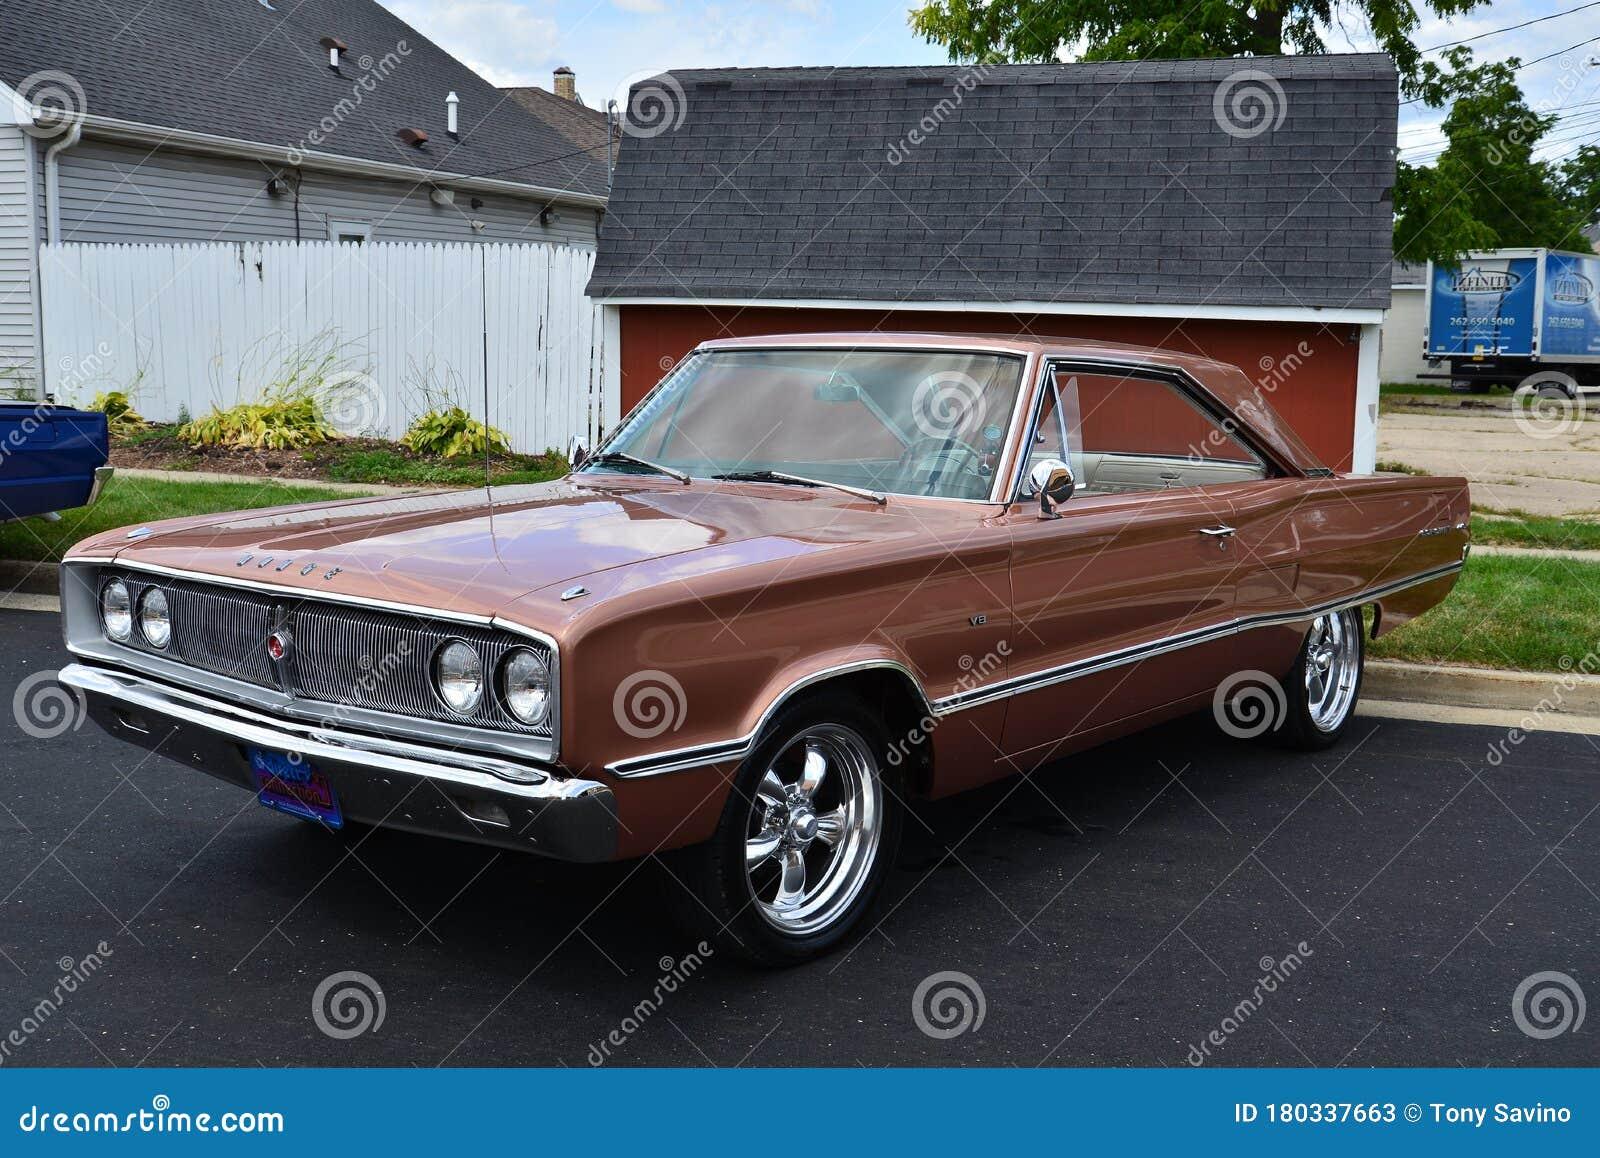 Bronze 1967 Dodge Coronet 440 Editorial Stock Photo Image Of Antique Aggressive 180337663